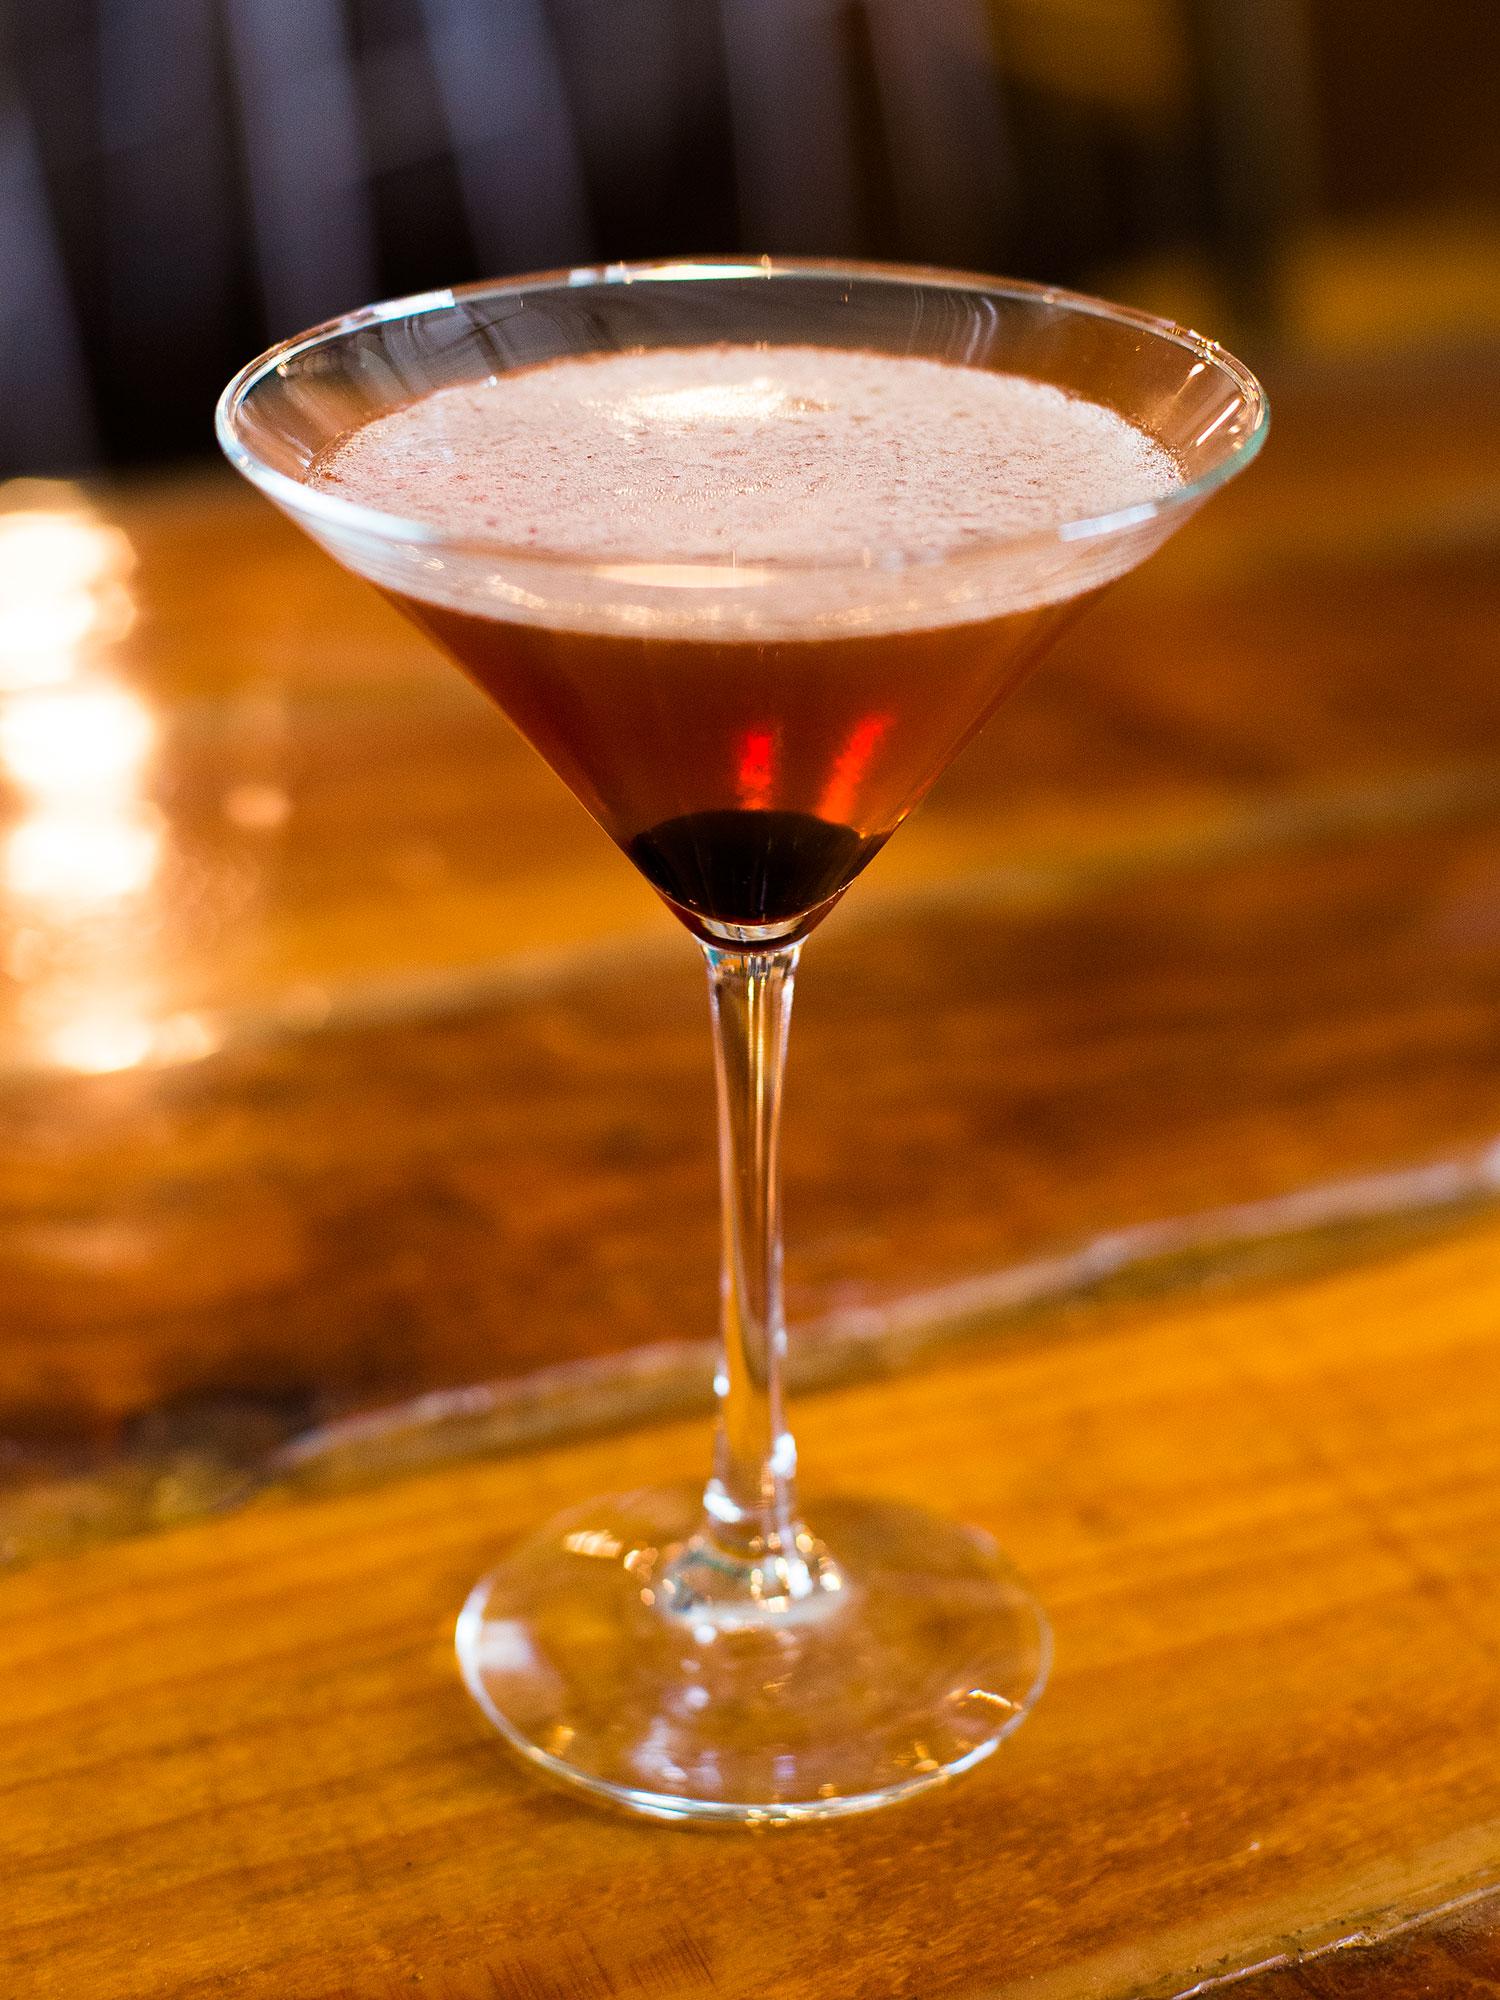 Feisty Manhattan: Feisty bourbon (distilled in Colorado), Contratto Rosso & Luxardo cherry